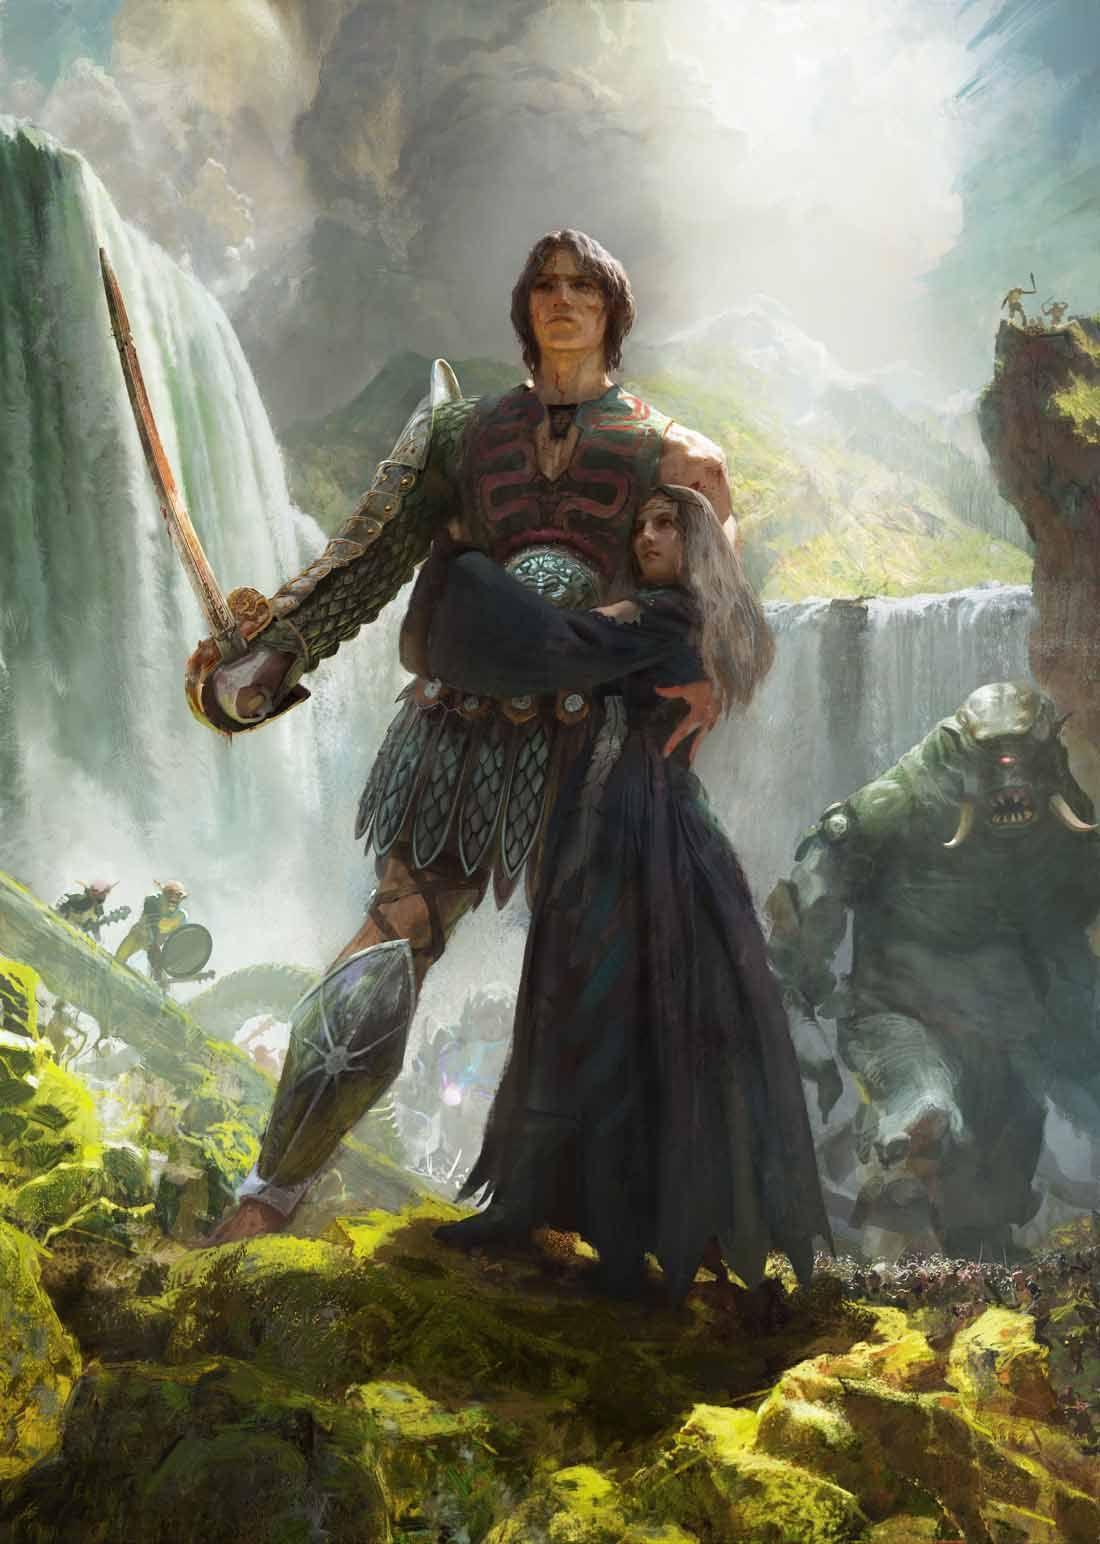 Dragons Dogma Dark Arisen Concept Art Video Games Dragons